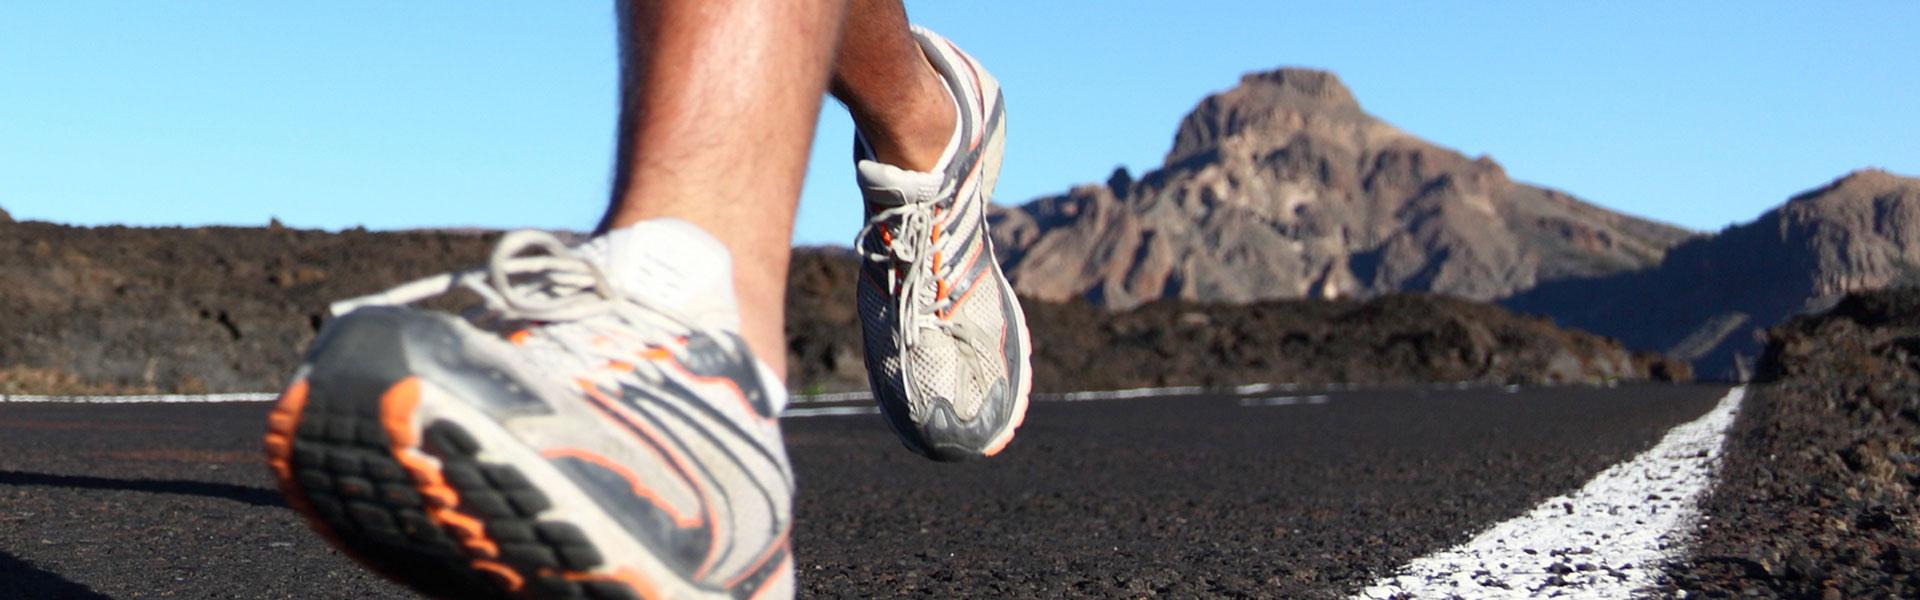 header-ejercicios_ok